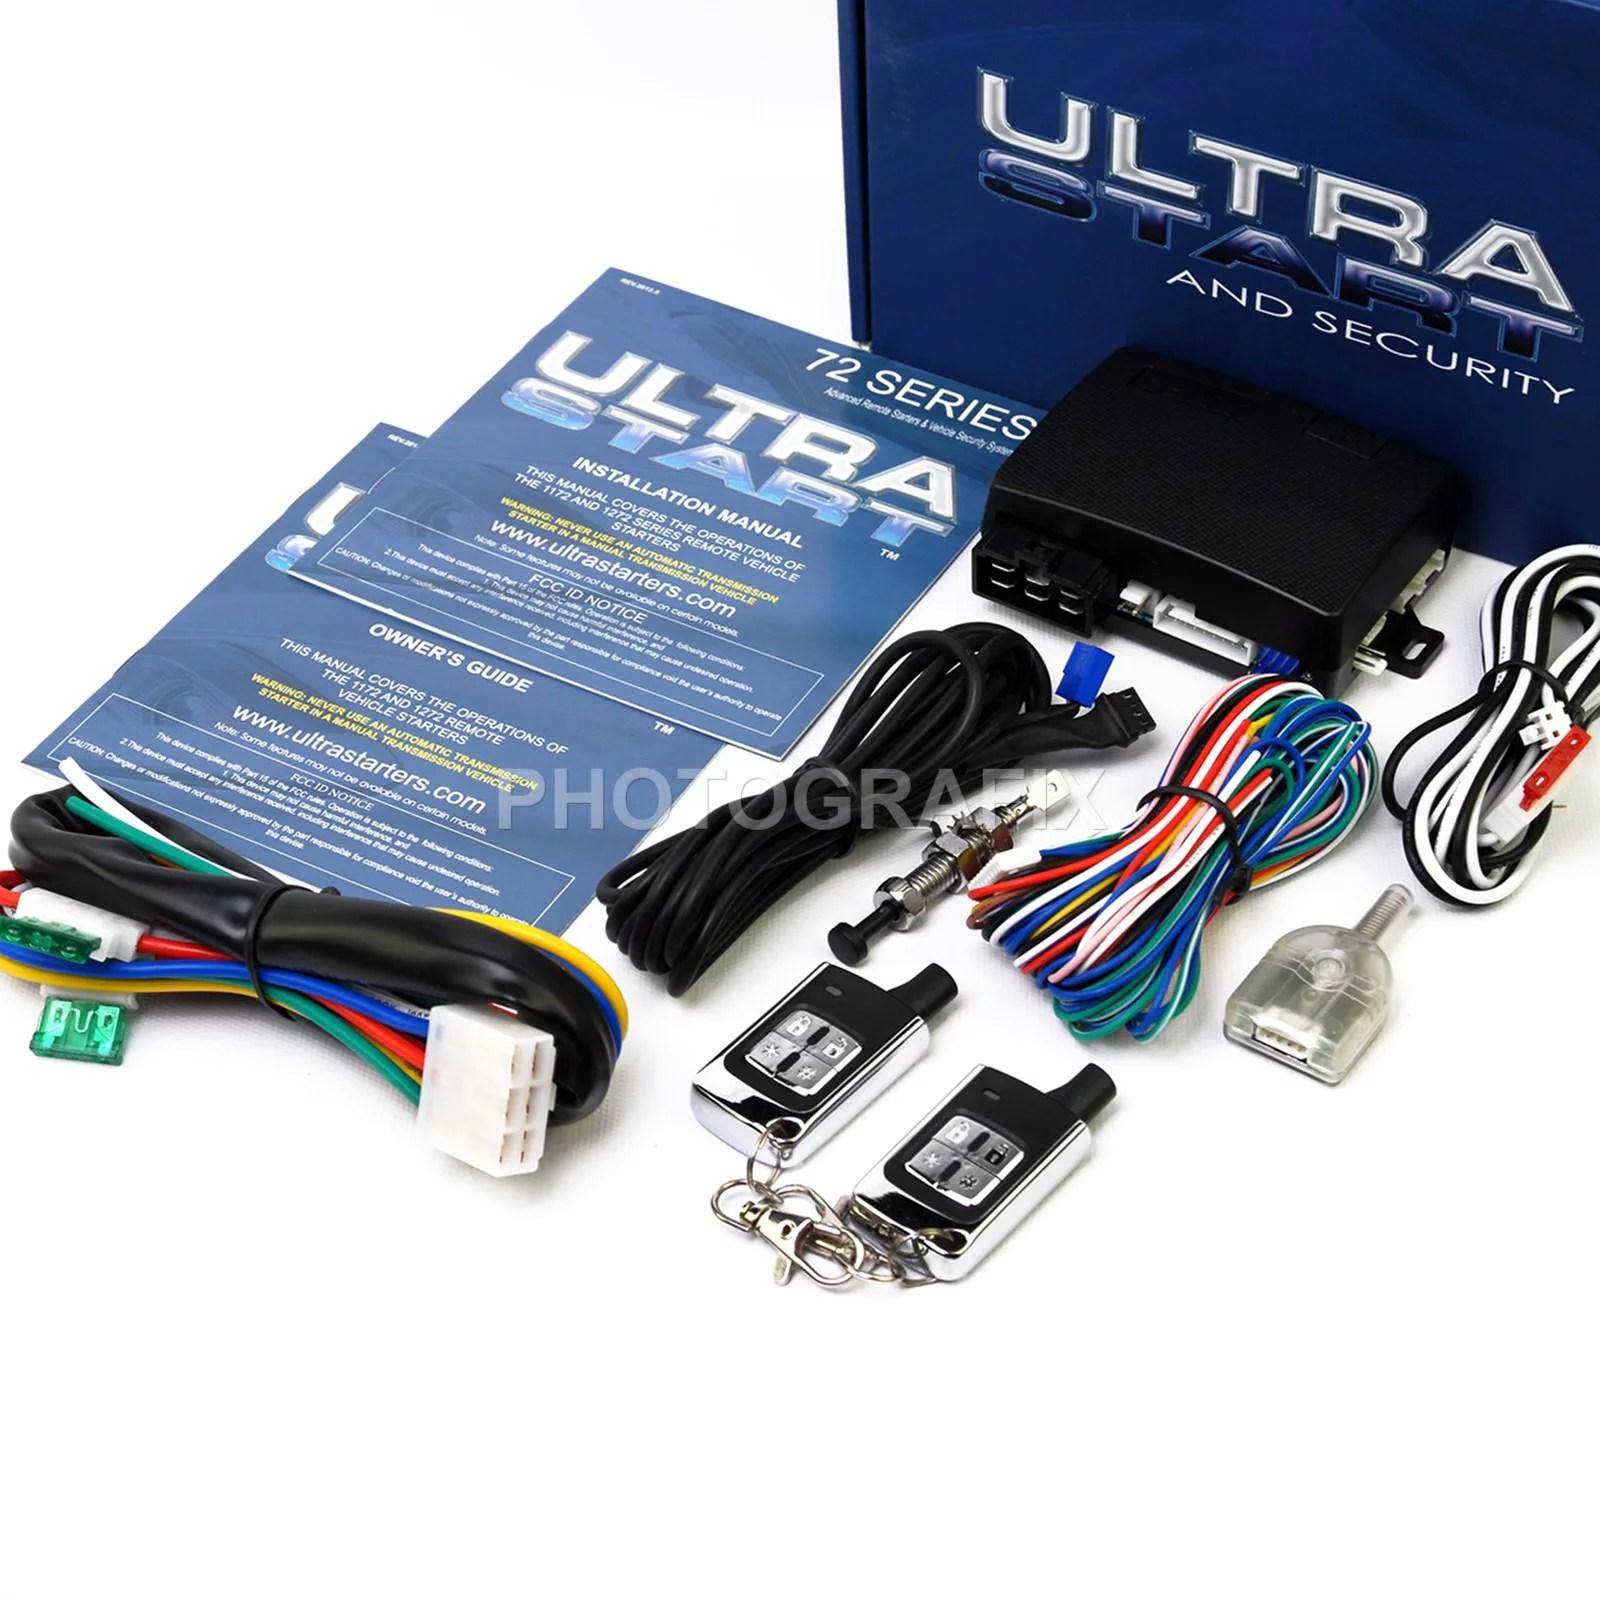 medium resolution of ultra start 1272 xr pro keyless auto remote car start starter diagrams start wiring remote oltrastart